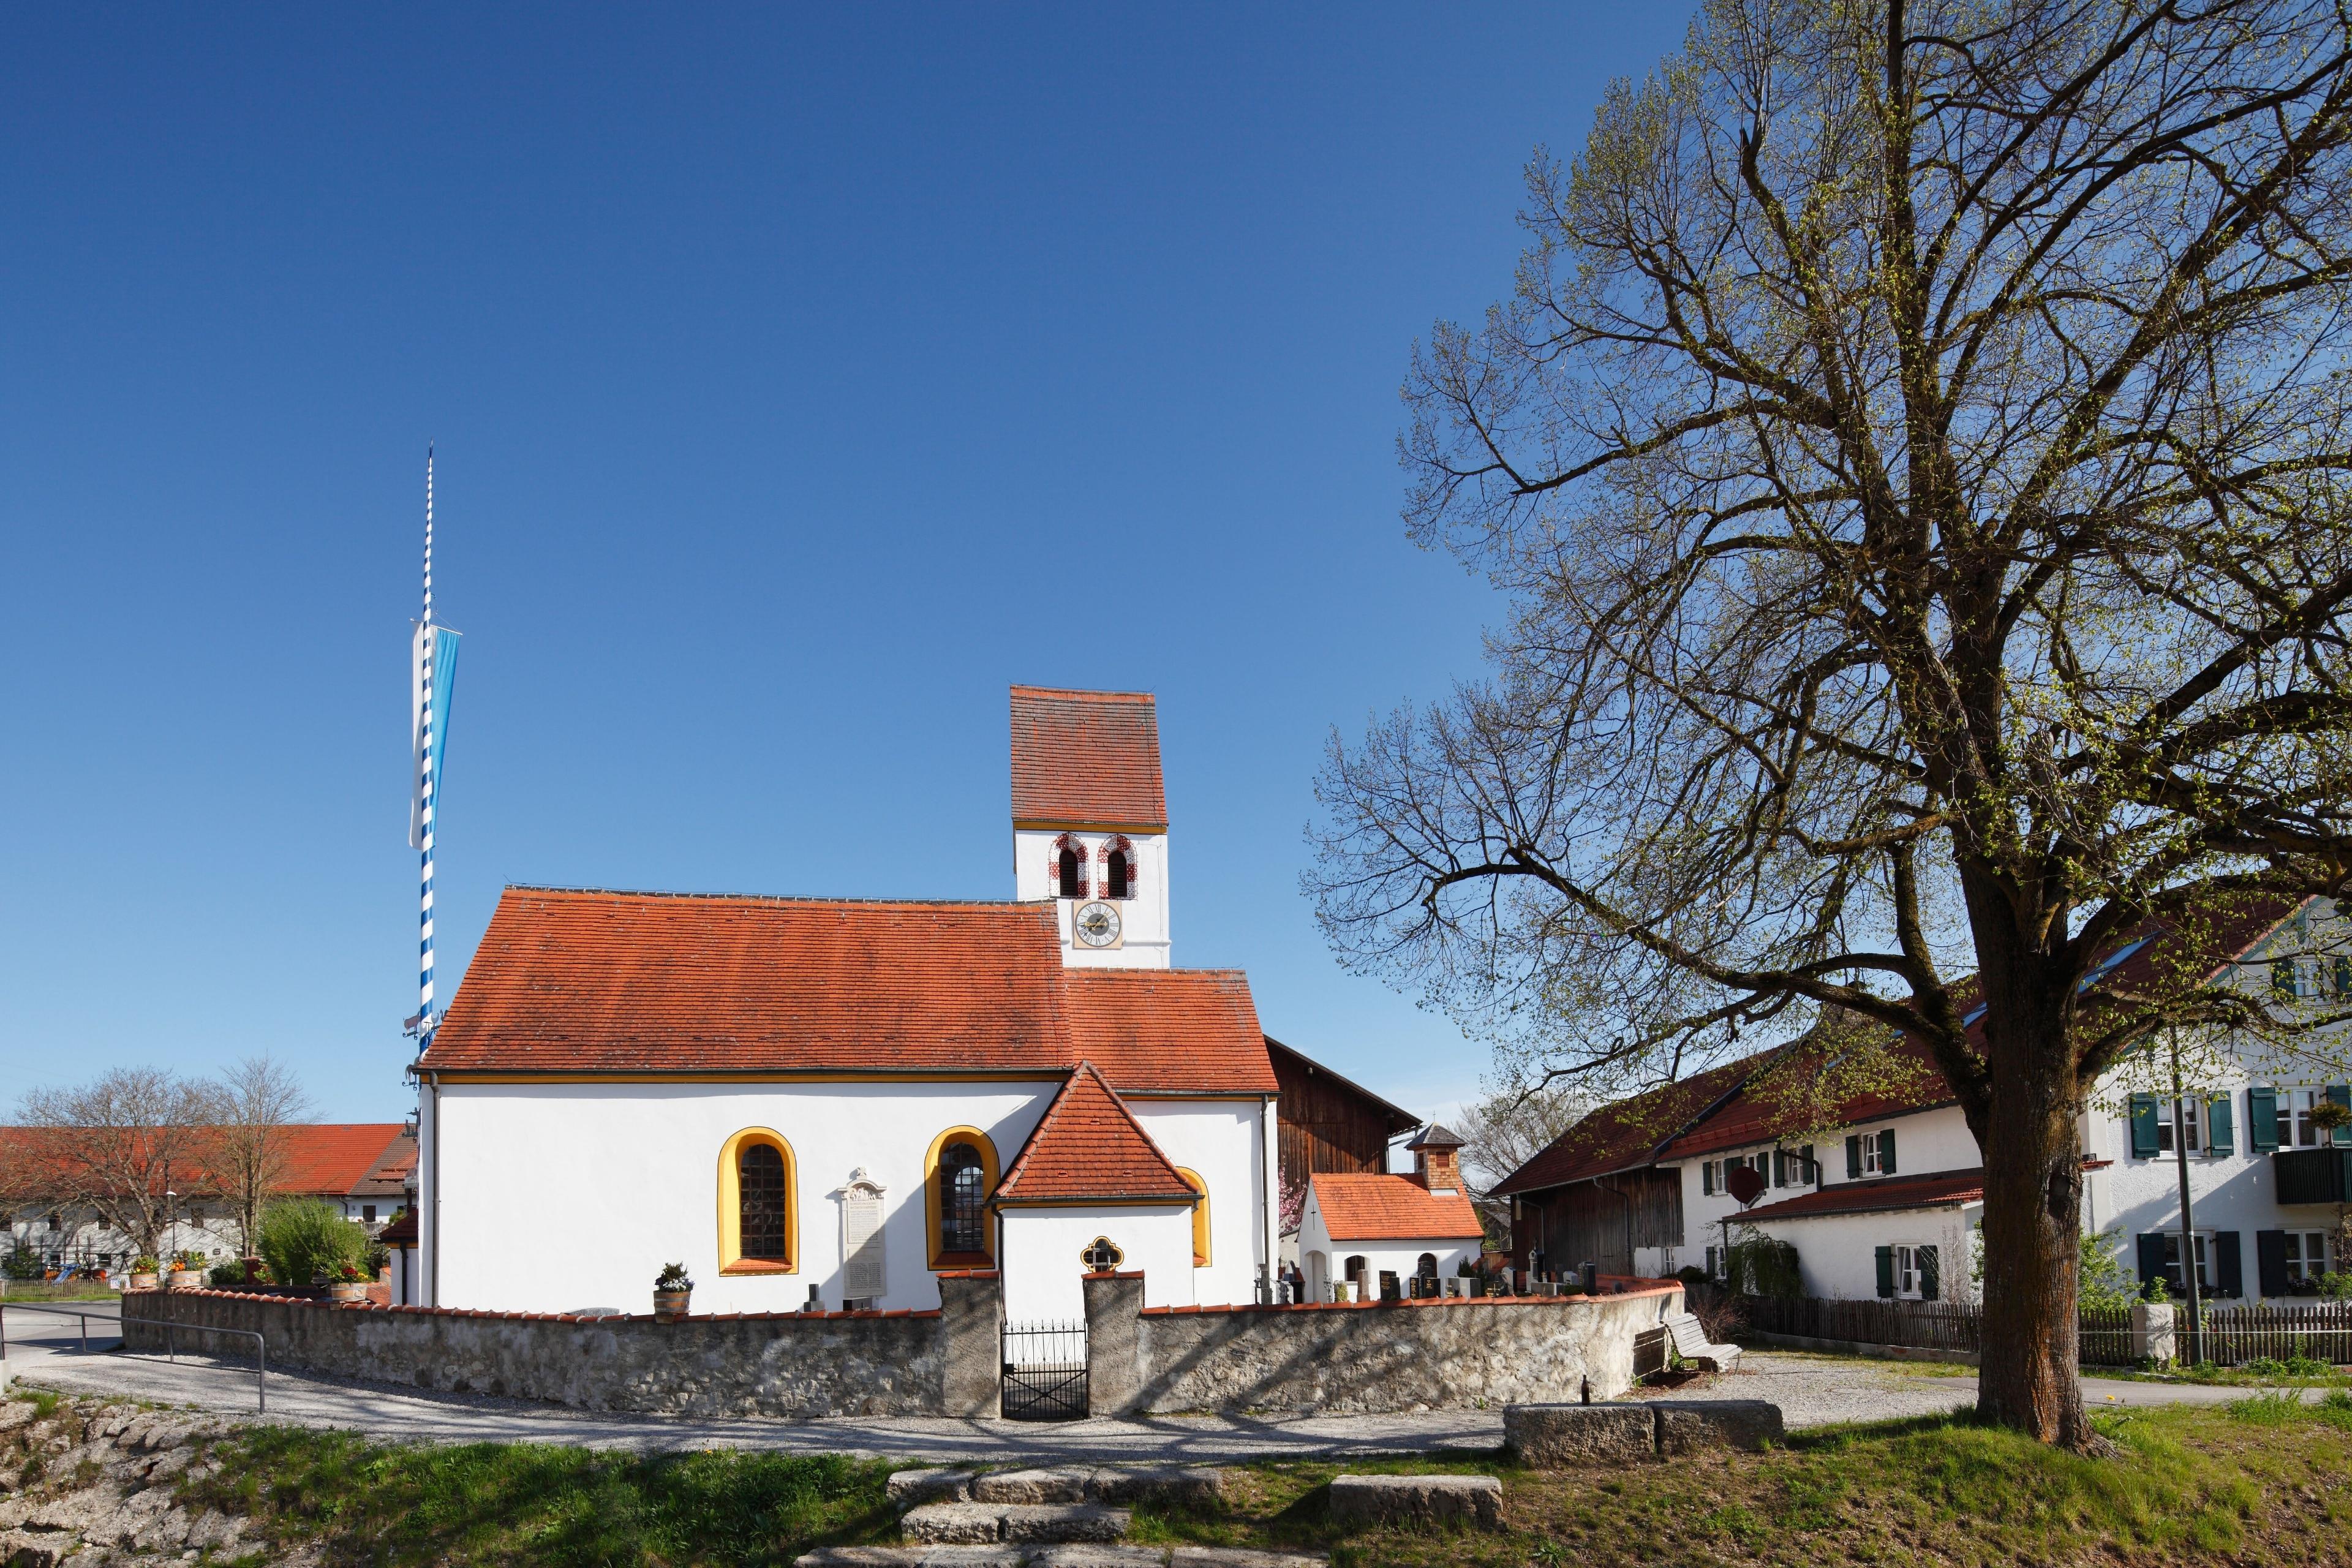 Pöcking, Bayern